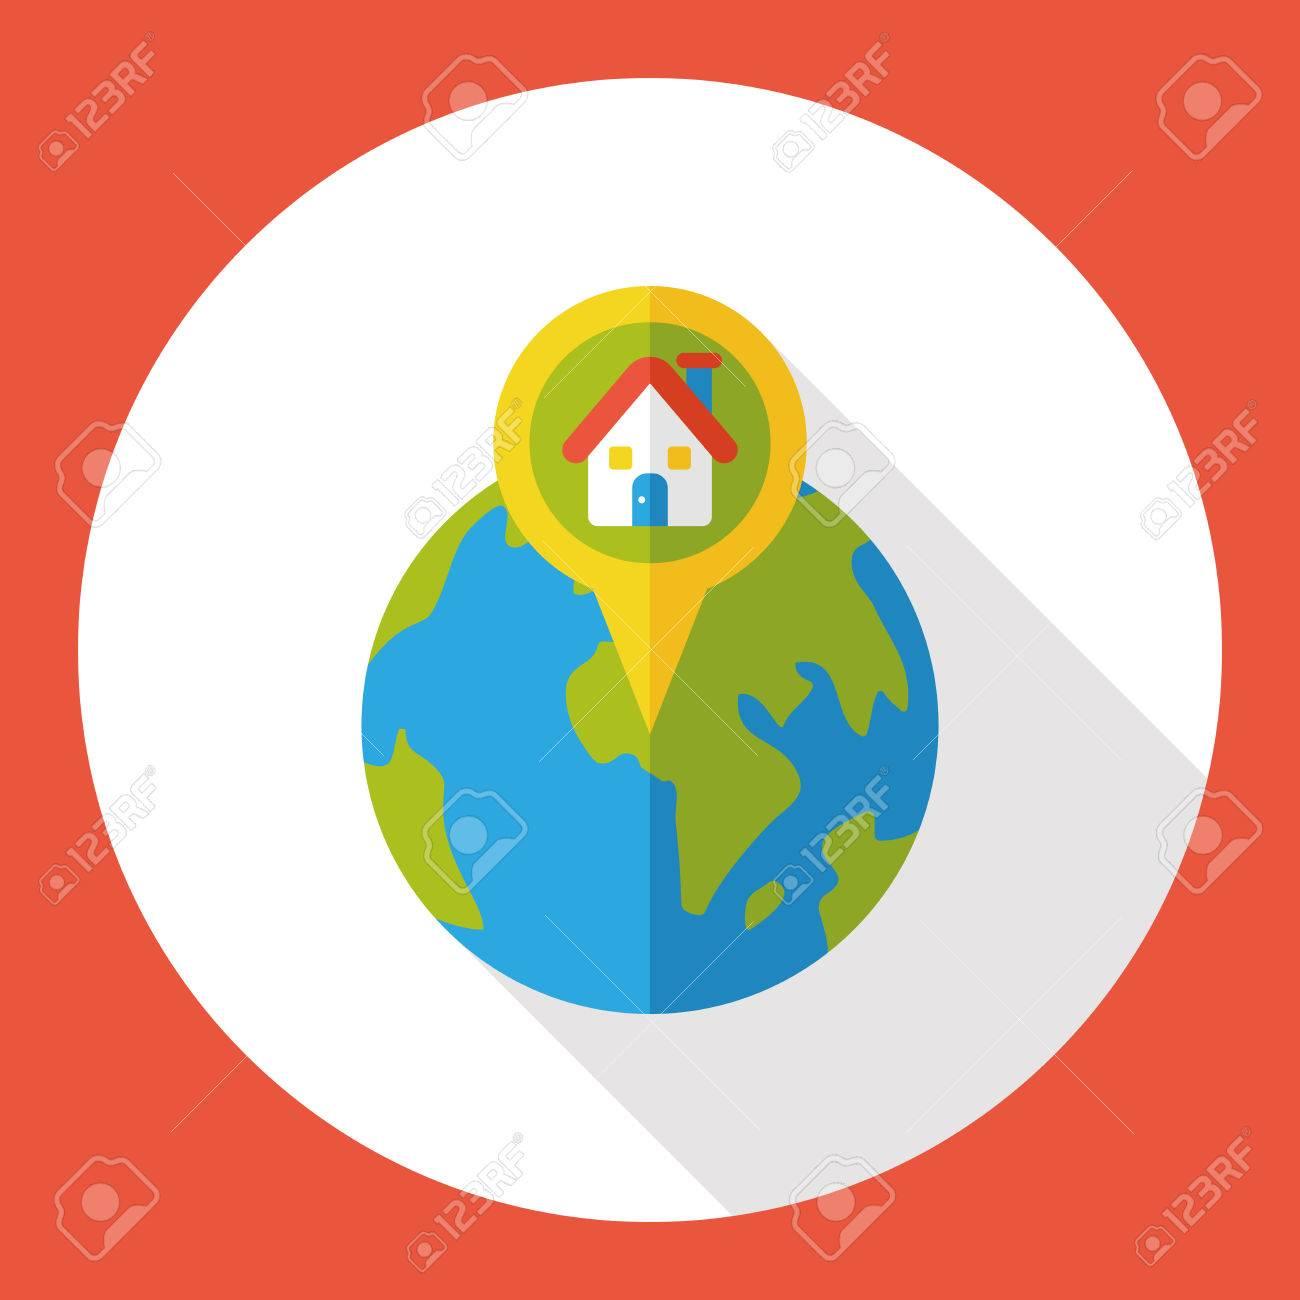 1300x1300 Internet World Location Flat Icon Royalty Free Cliparts, Vectors